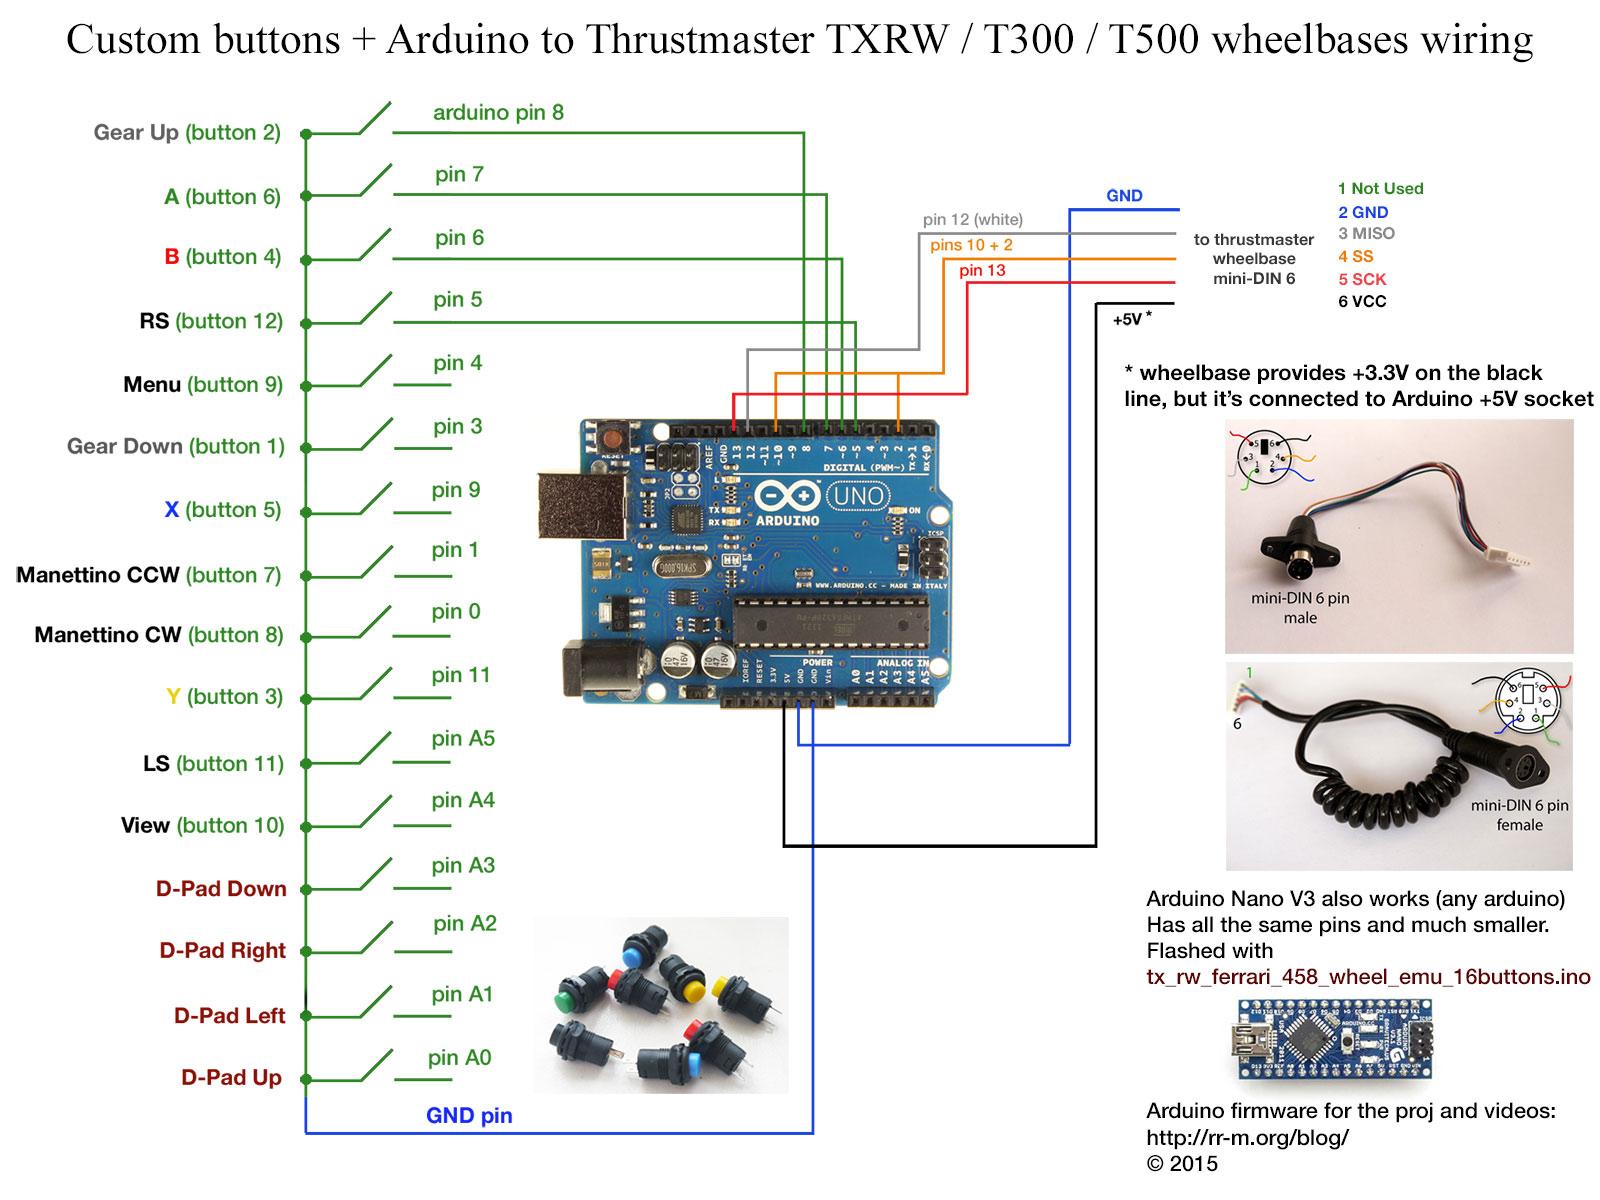 Thrustmaster Tx Rw Wheelbase And Arduino - Part 3